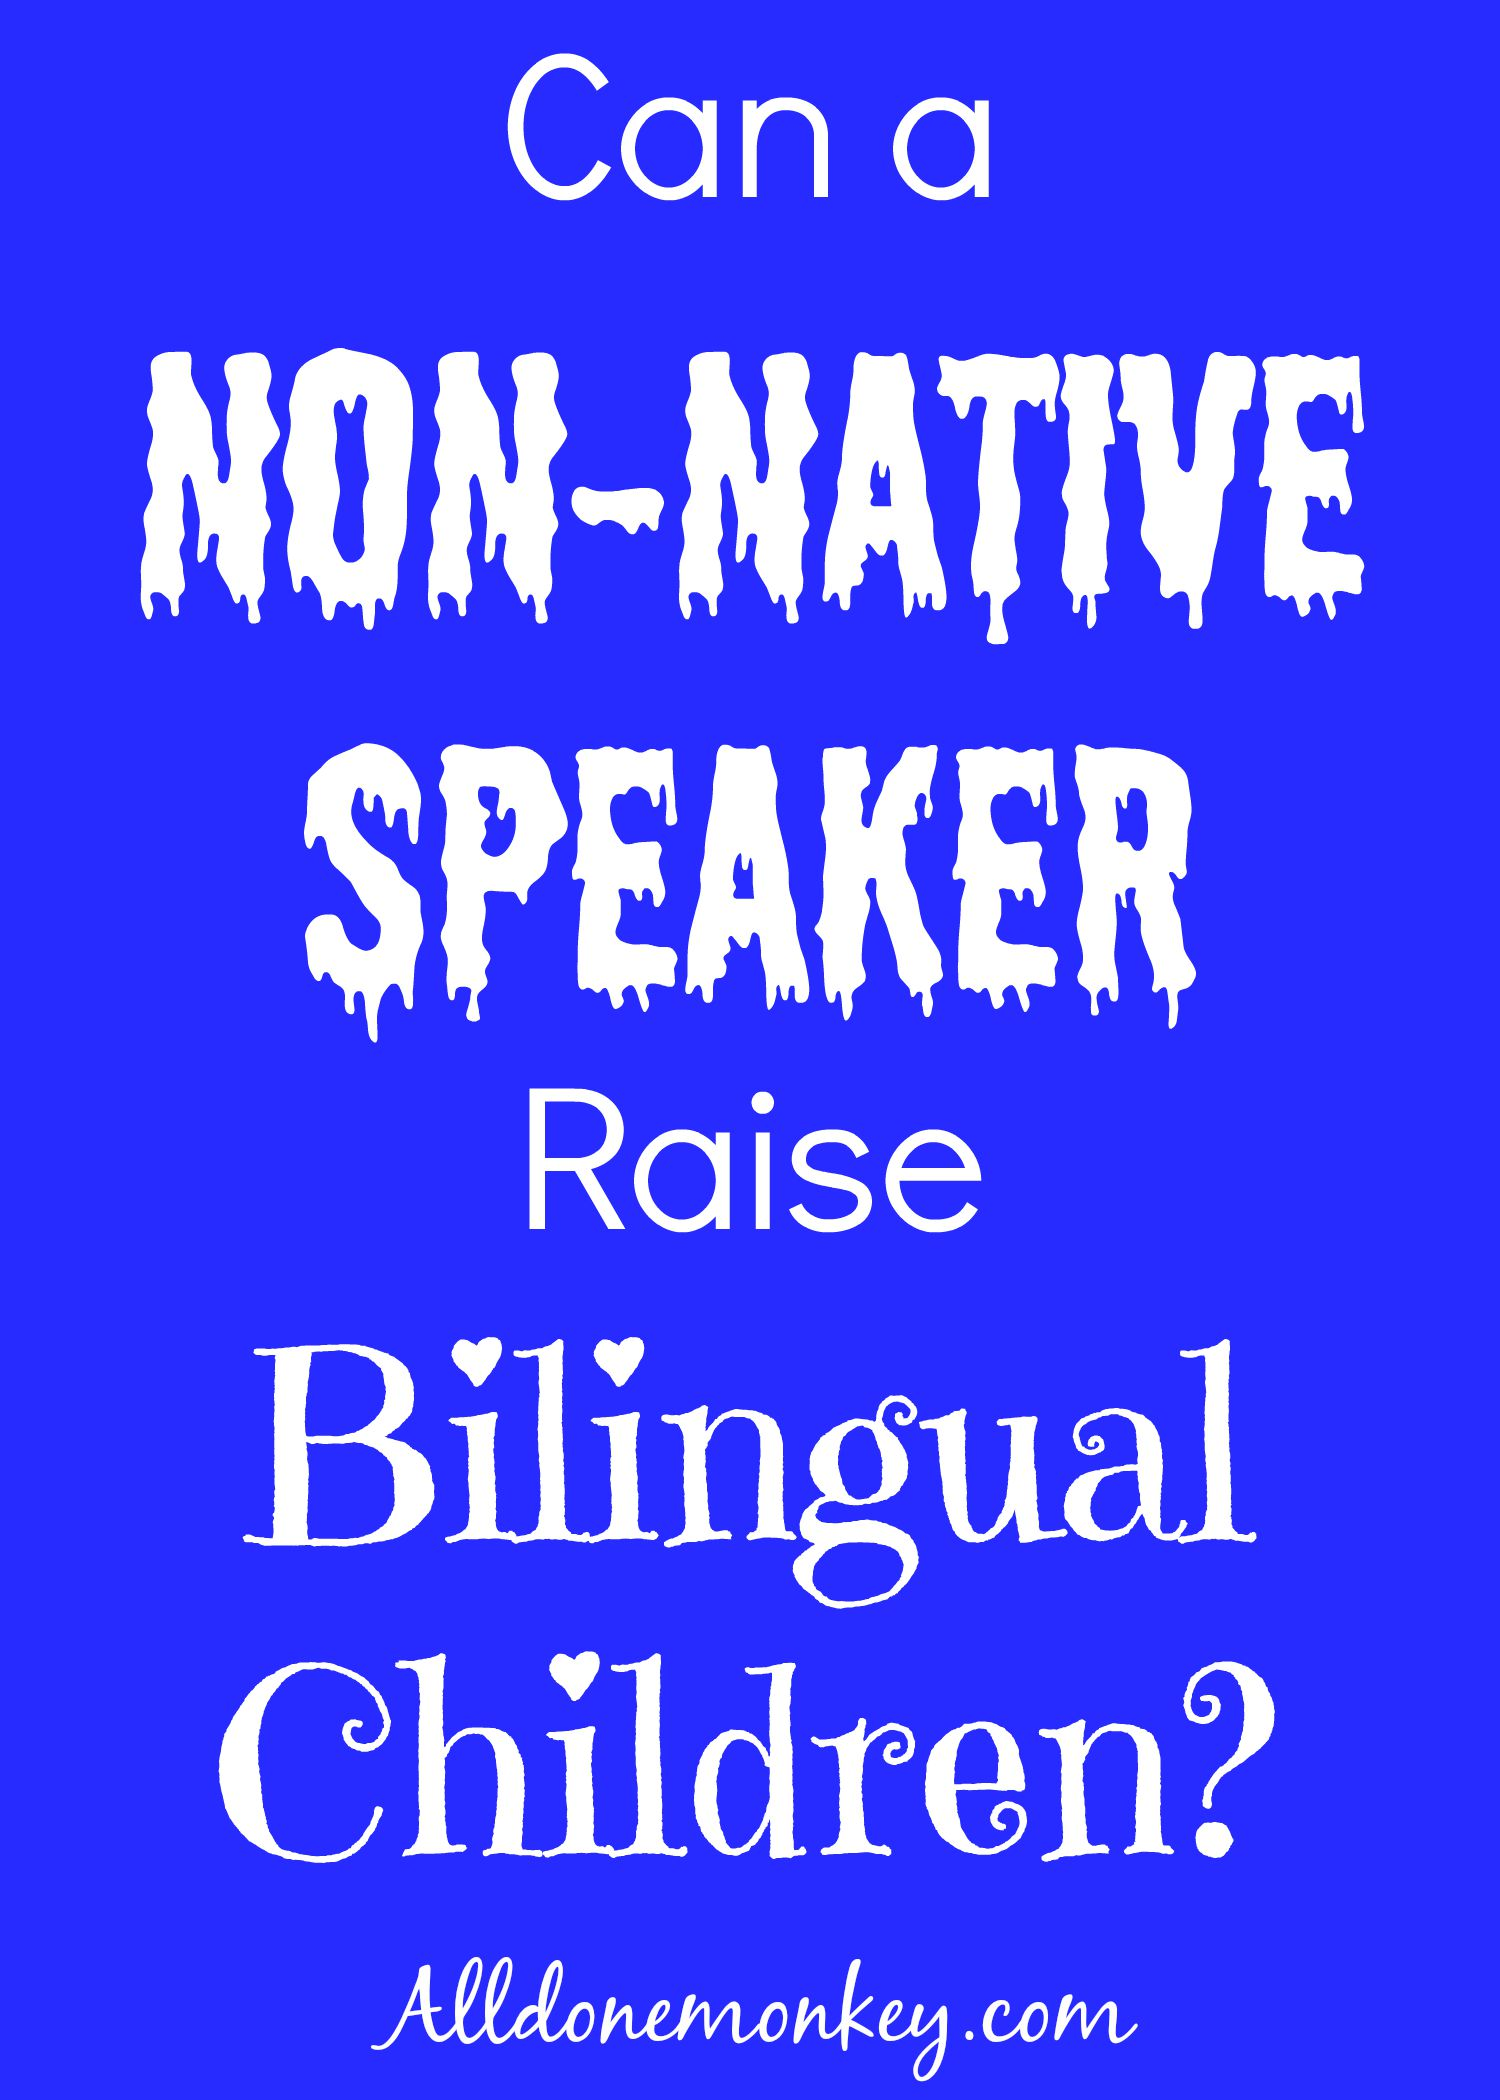 Raising Multilingual Kids: Can a Non-Native Speaker Raise Bilingual Children?   Alldonemonkey.com